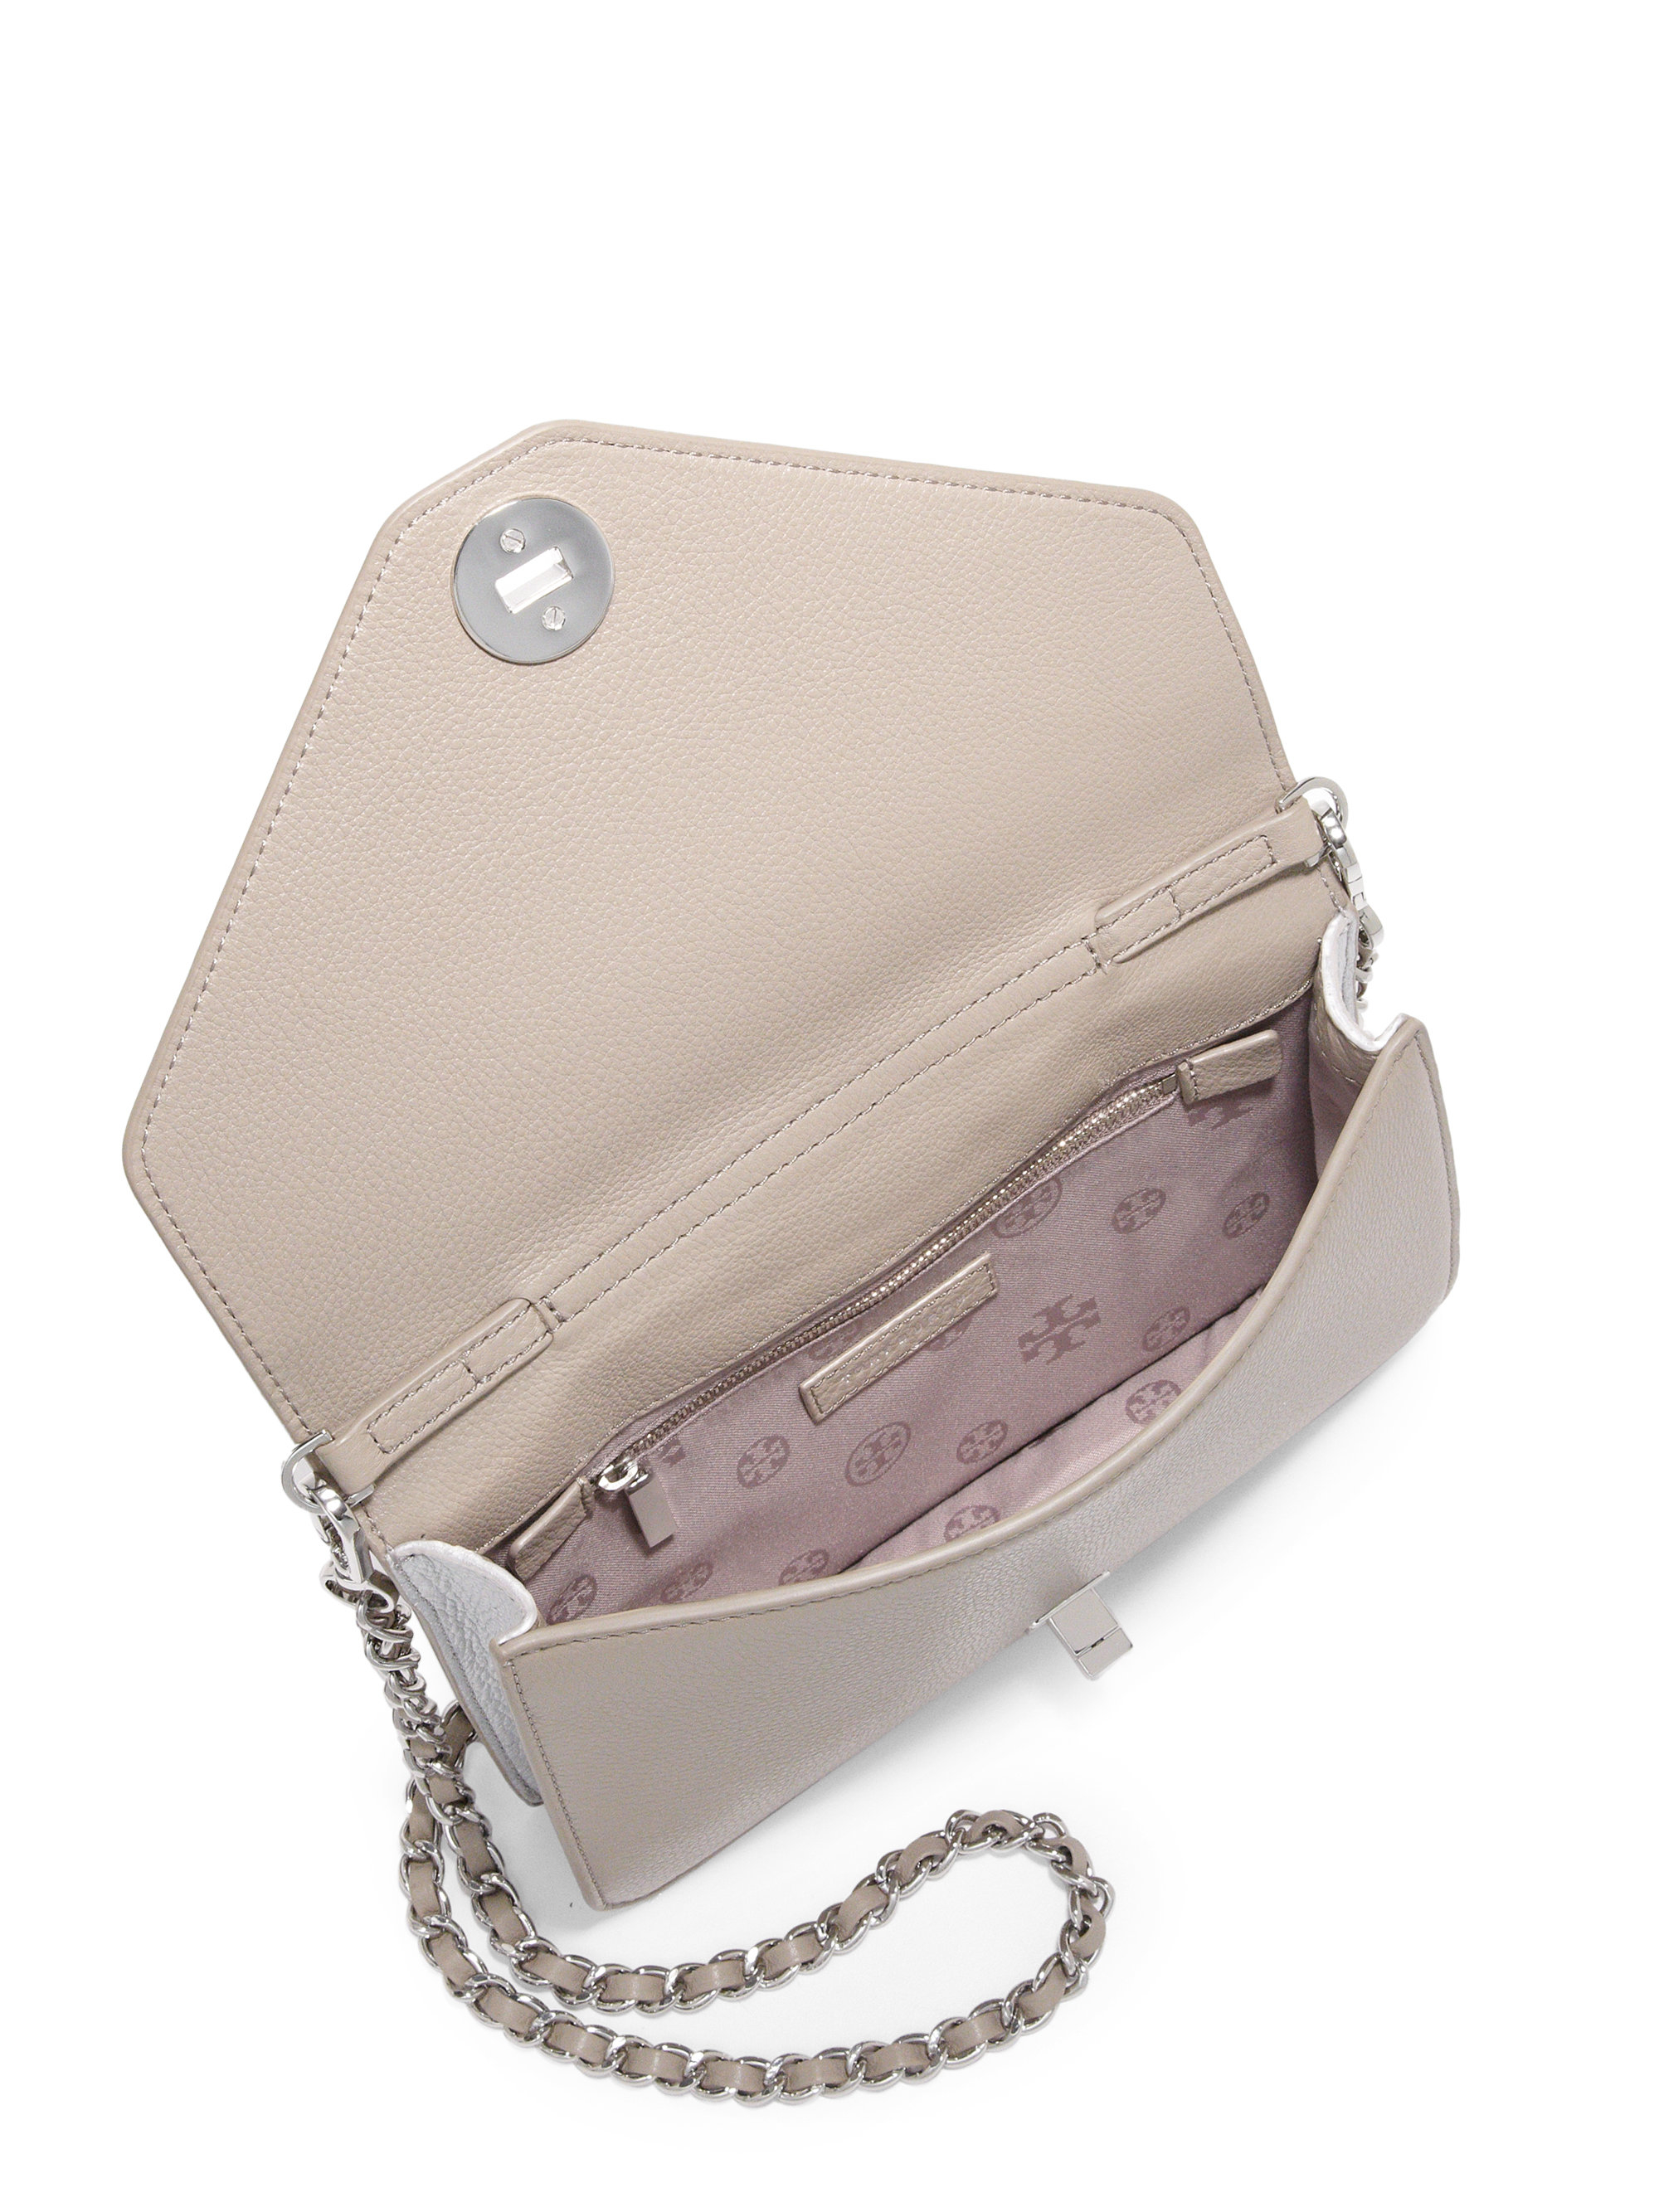 c468e897864 Lyst - Tory Burch Kira Leather Envelope Clutch in Gray